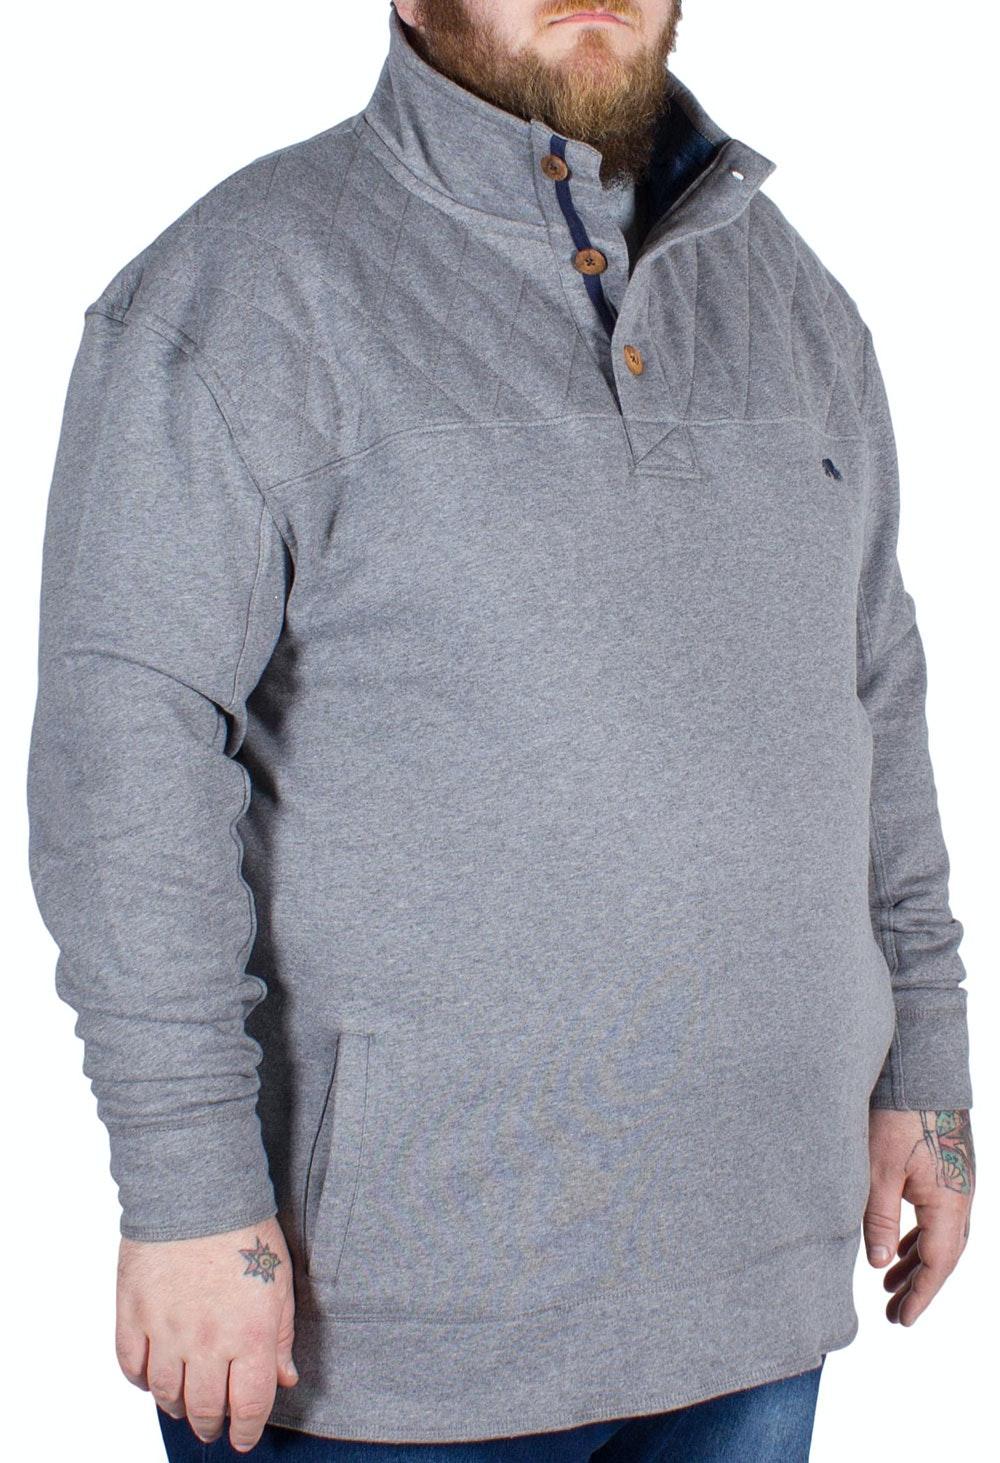 Raging Bull Funnel Neck Sweater Grey